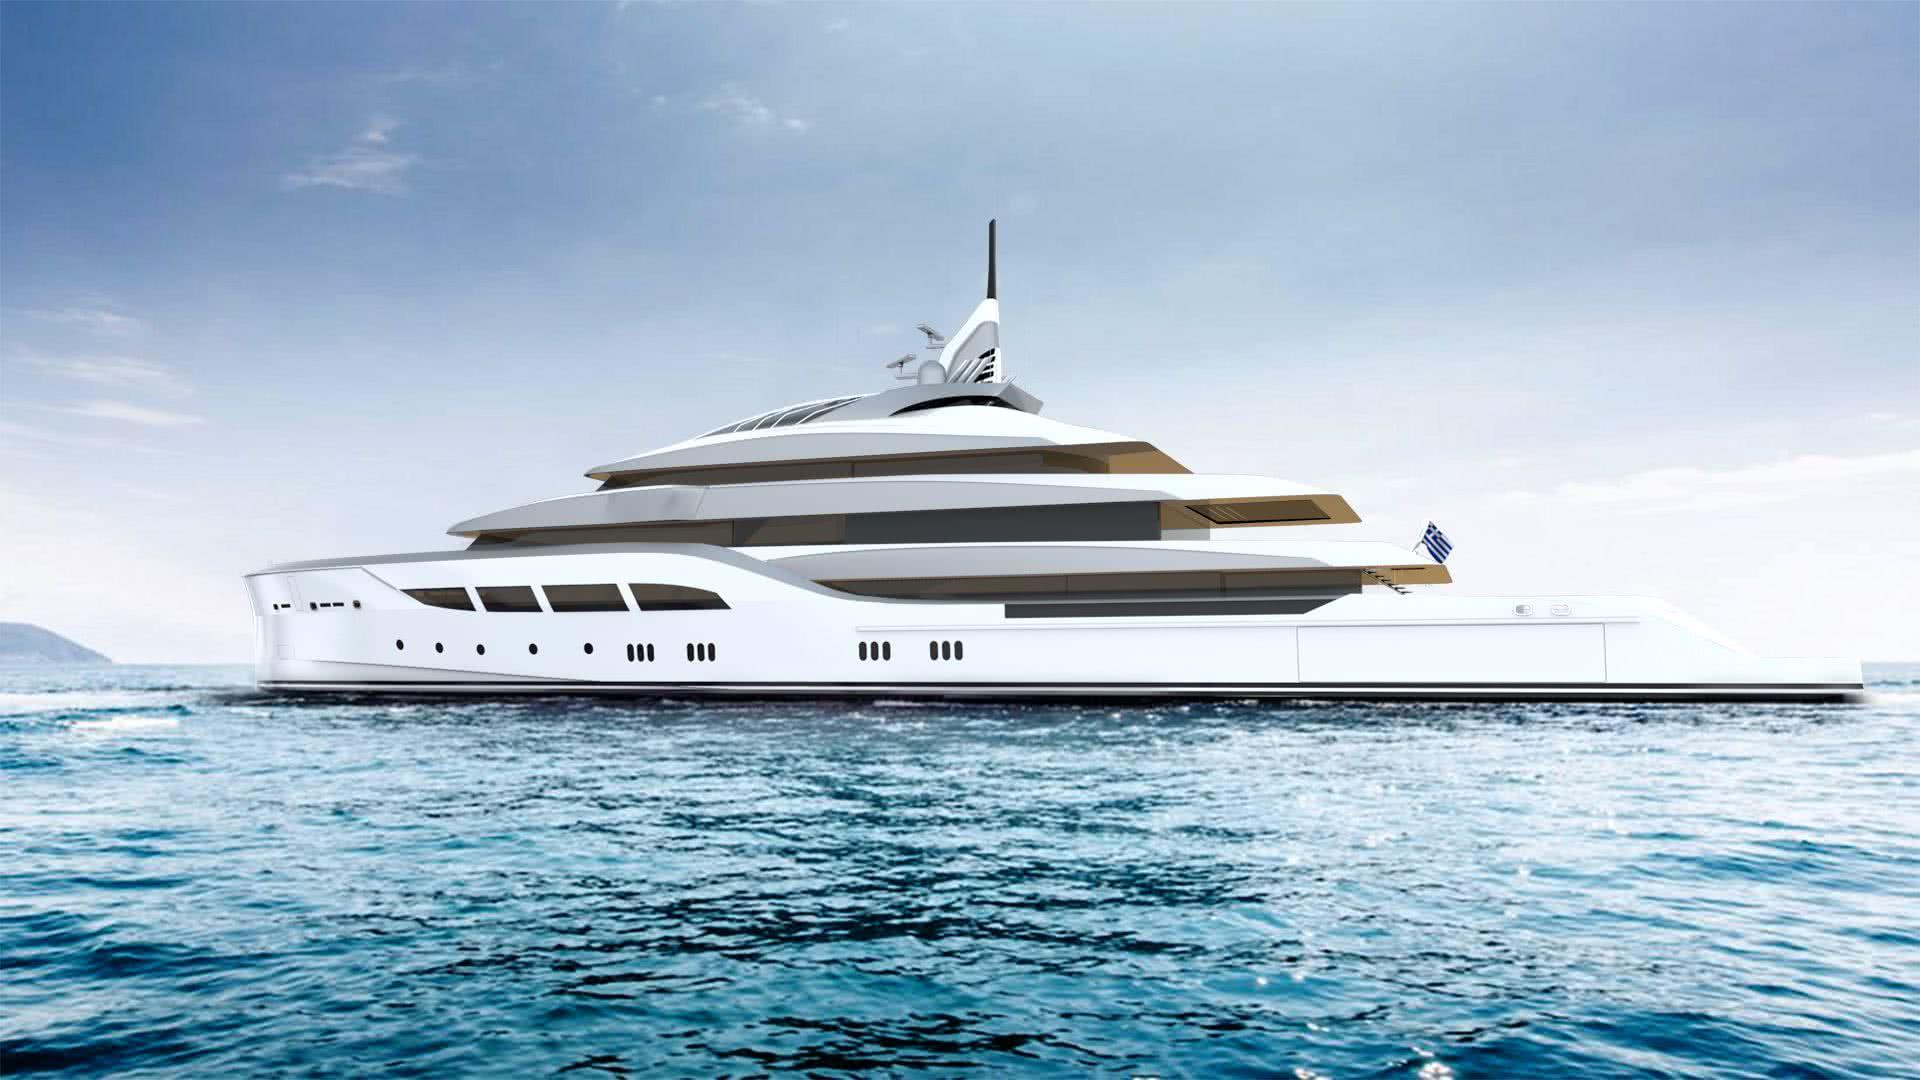 Koroni Aristotelis Betsis Yacht Design